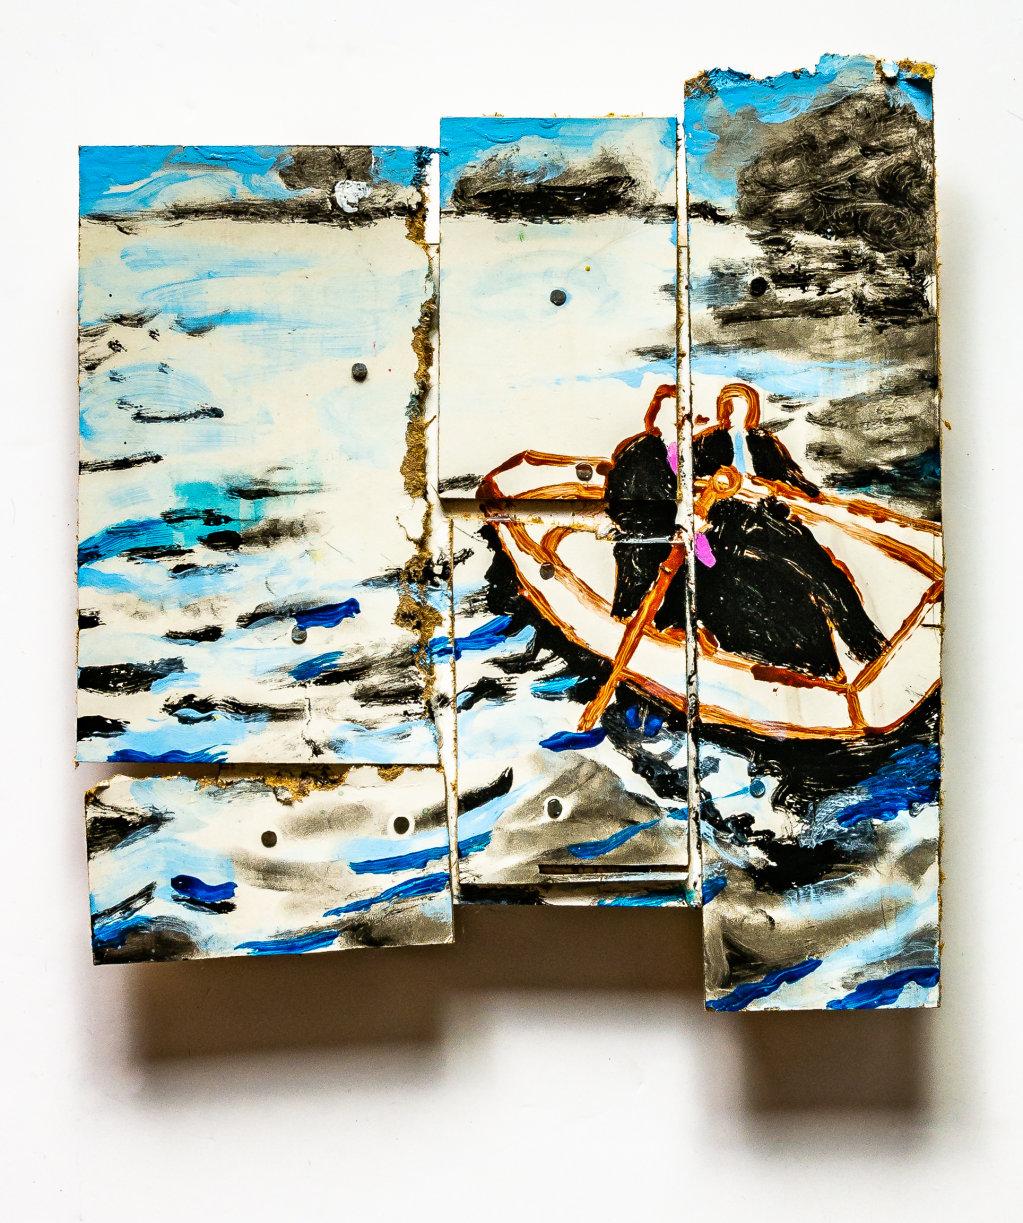 Boris in a Boat (Hardboard Scraps) 2018